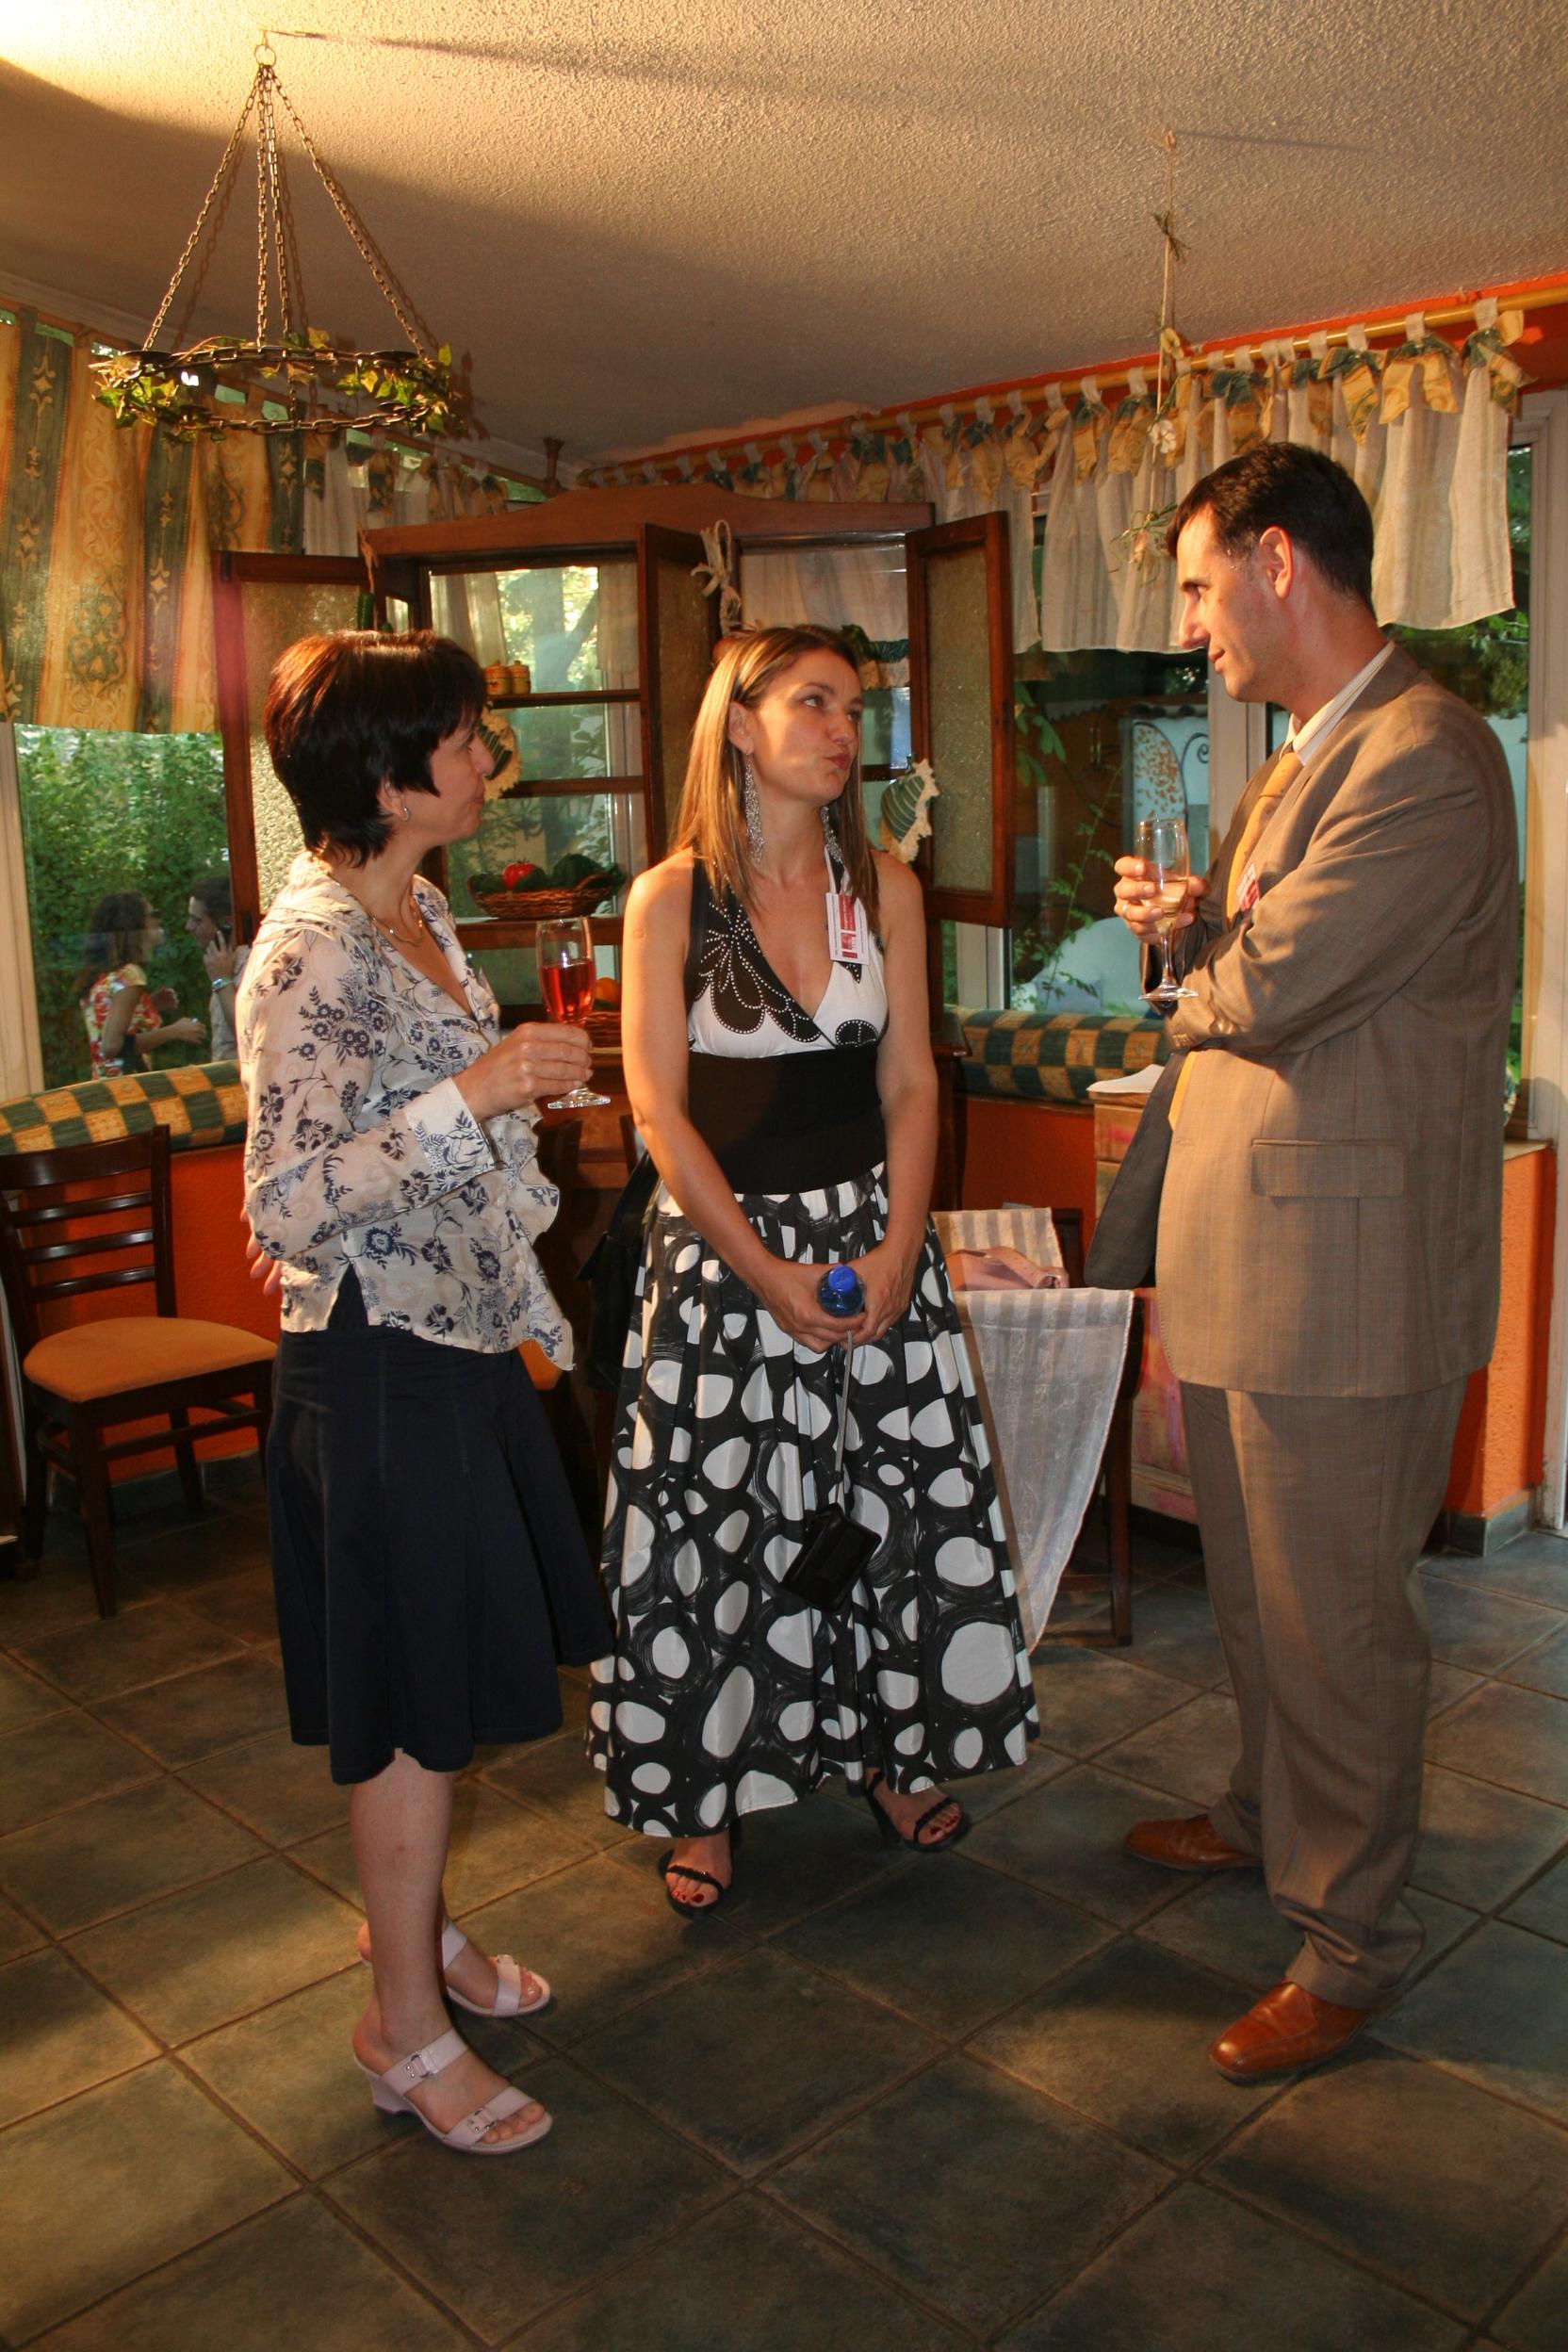 Stefan Vassilev, Gergana Ivanova and Valeria Jekova